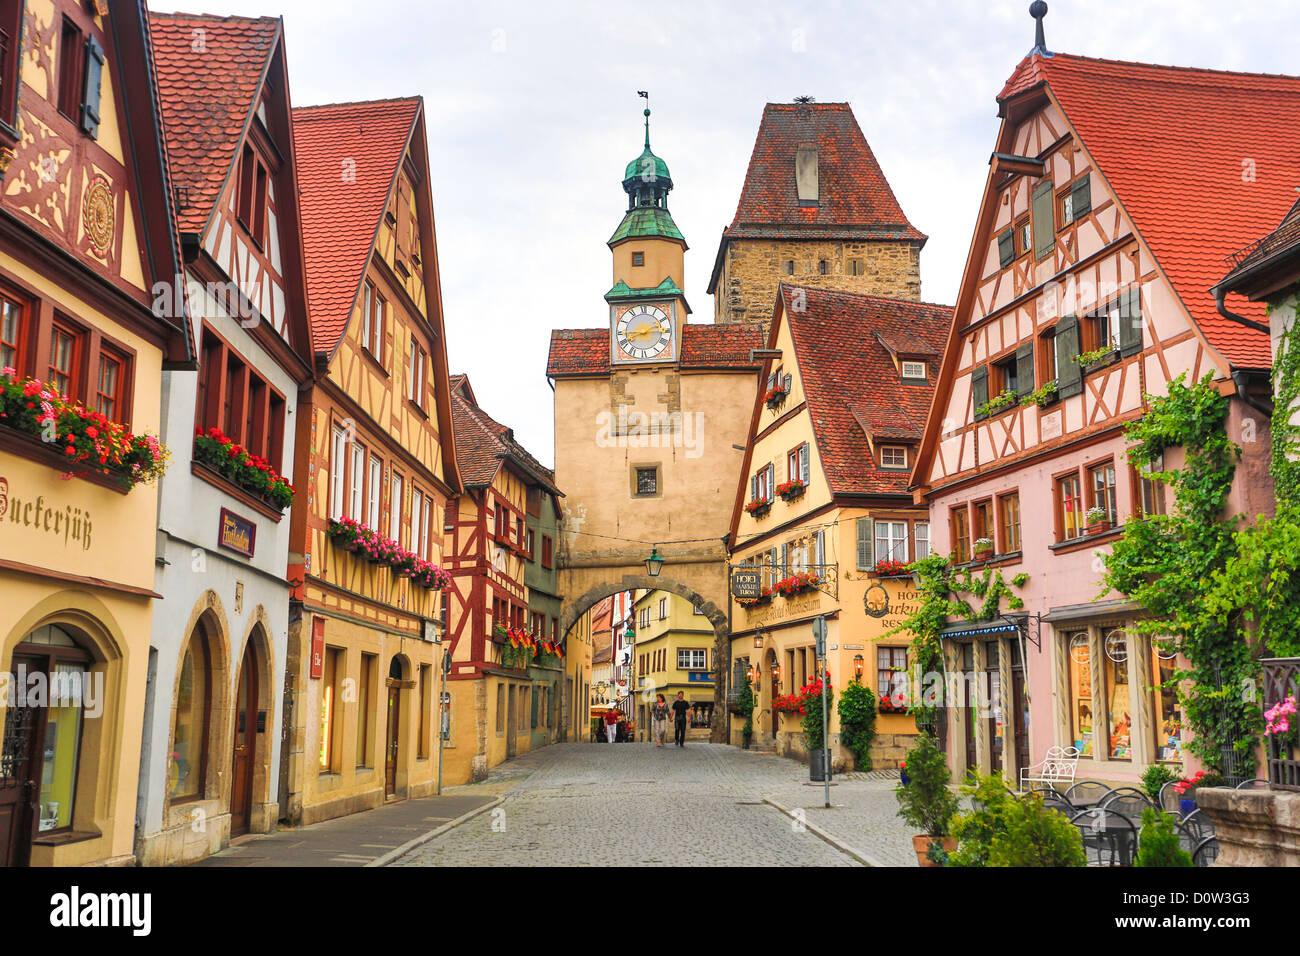 Allemagne, Europe, voyage, Rothenburg, Route Romantique, Rodergasse, Rue, Markus, Gate, l'architecture, Bavaria, Photo Stock